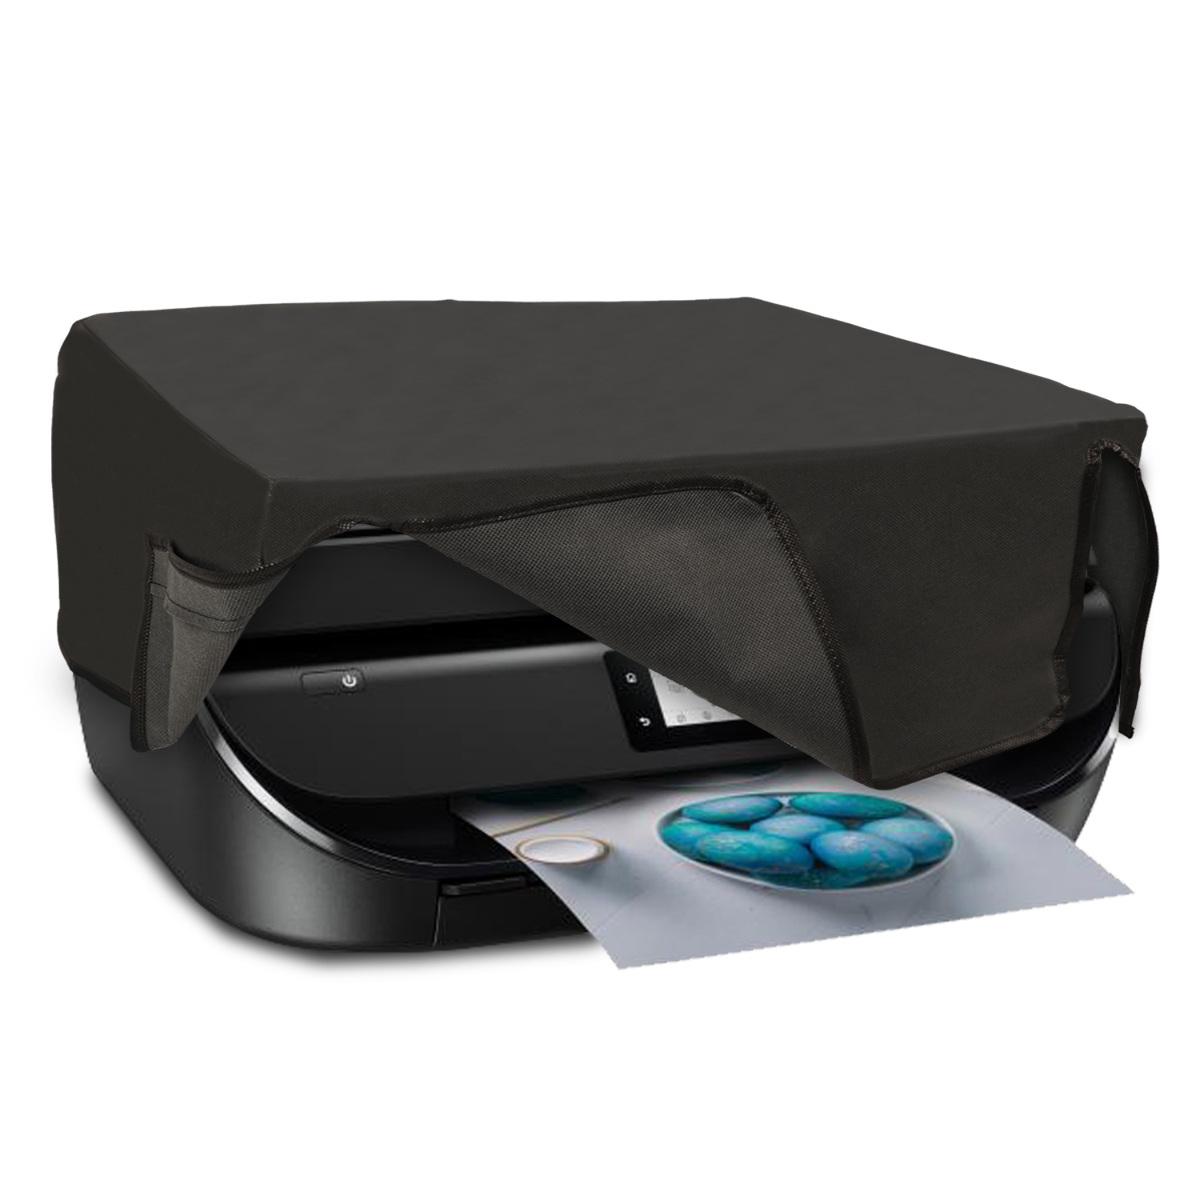 KW Κάλυμμα Εκτυπωτή HP OfficeJet 5230 / 5232 - Dark Grey (46826.19)